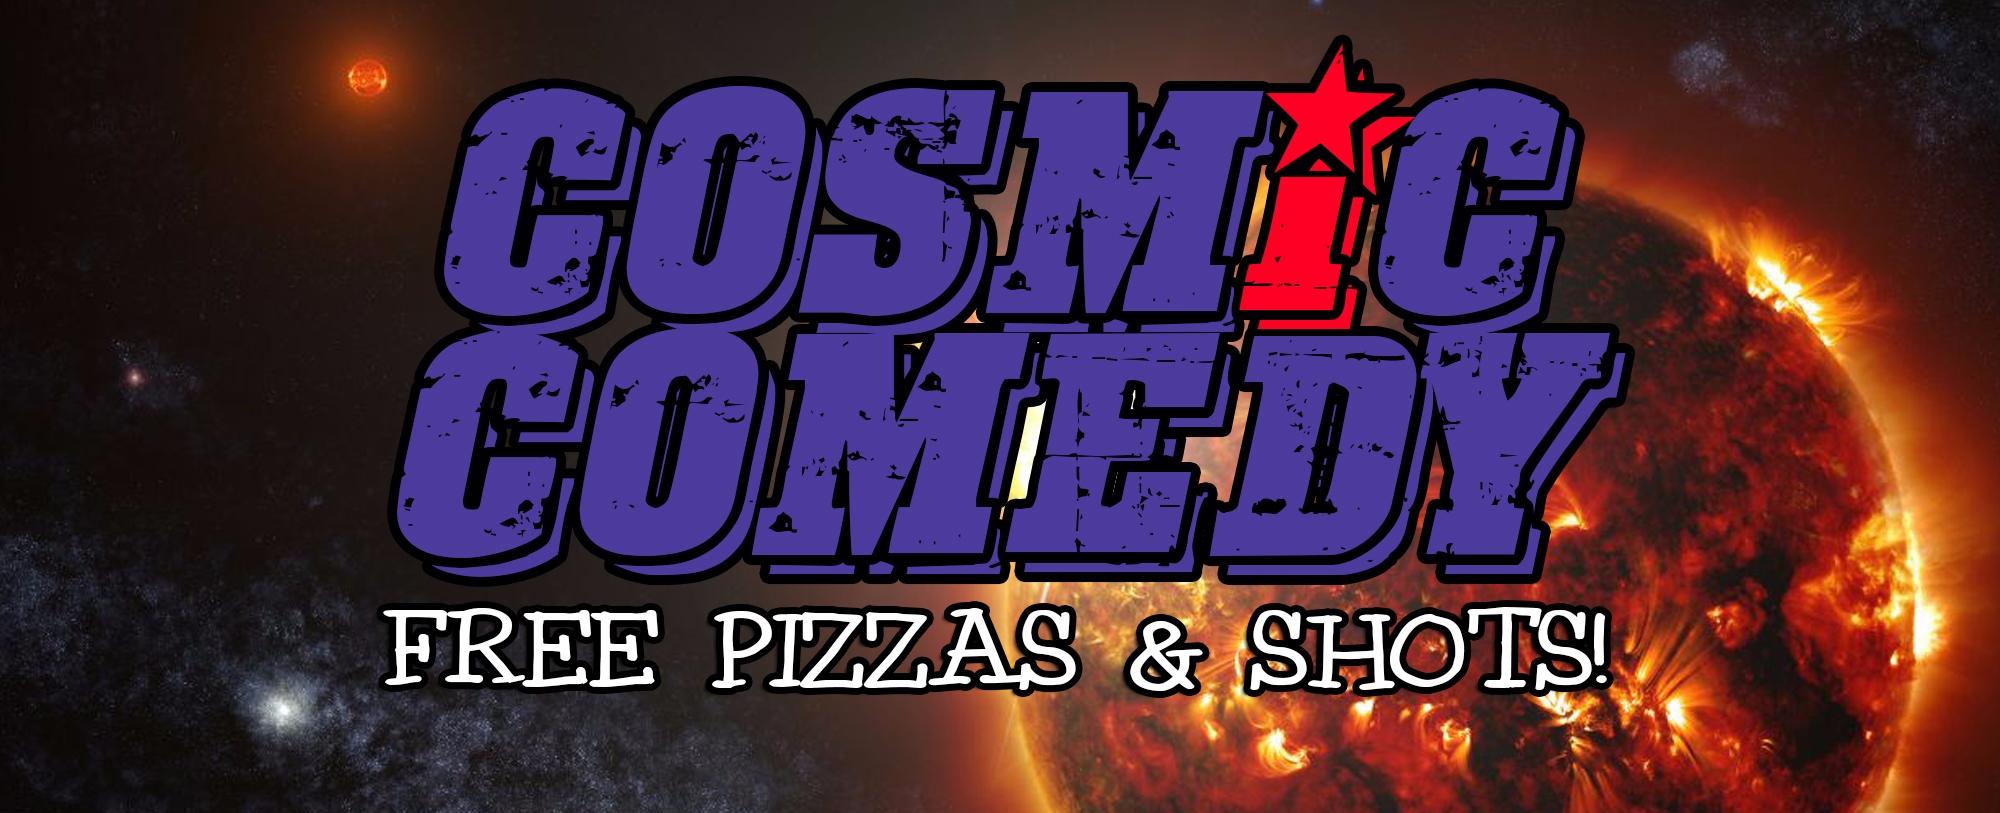 Cosmic Comedy Club Free pizza s - neil_numb | ello